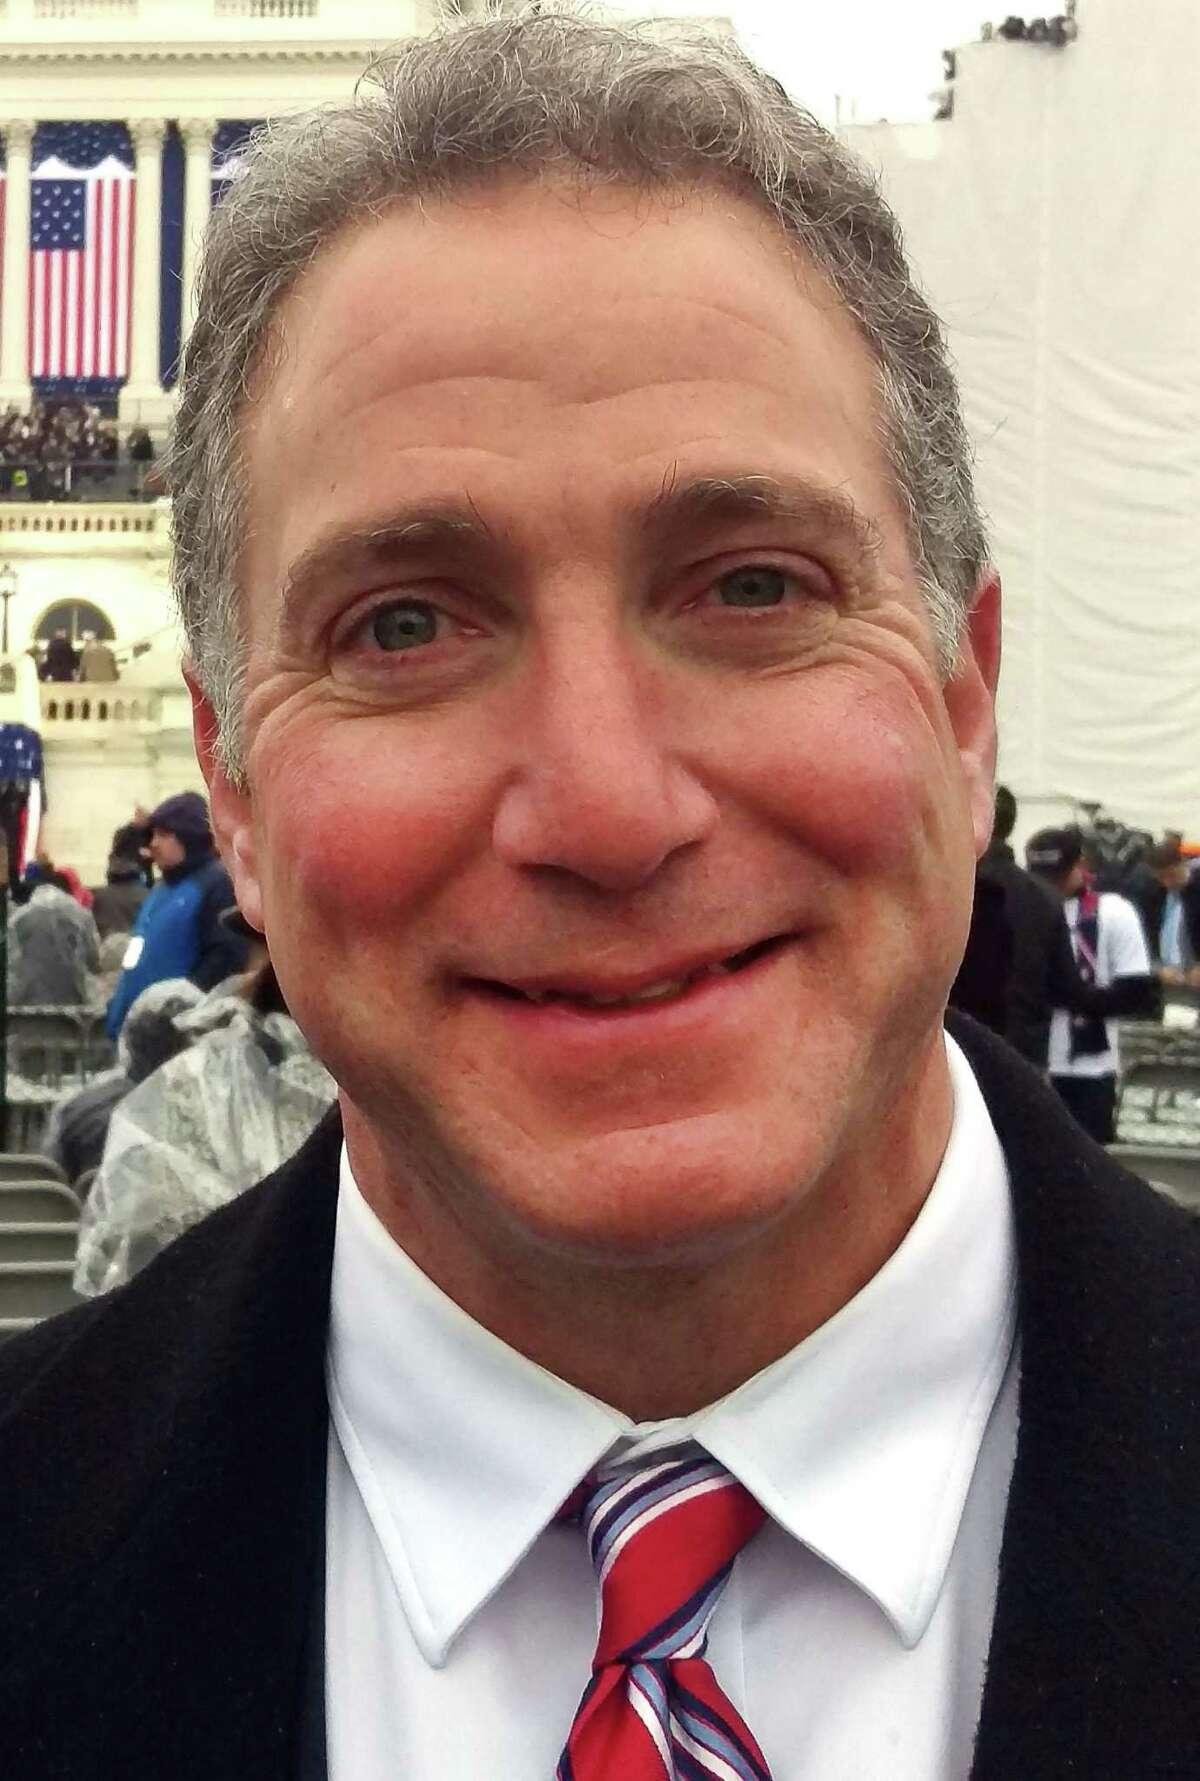 Matthew Corey, Republican candidate for U.S. Senate, taunted Sen. Chris Murphy, the Democrat seeking a second term, for refusing to debate him more than once.